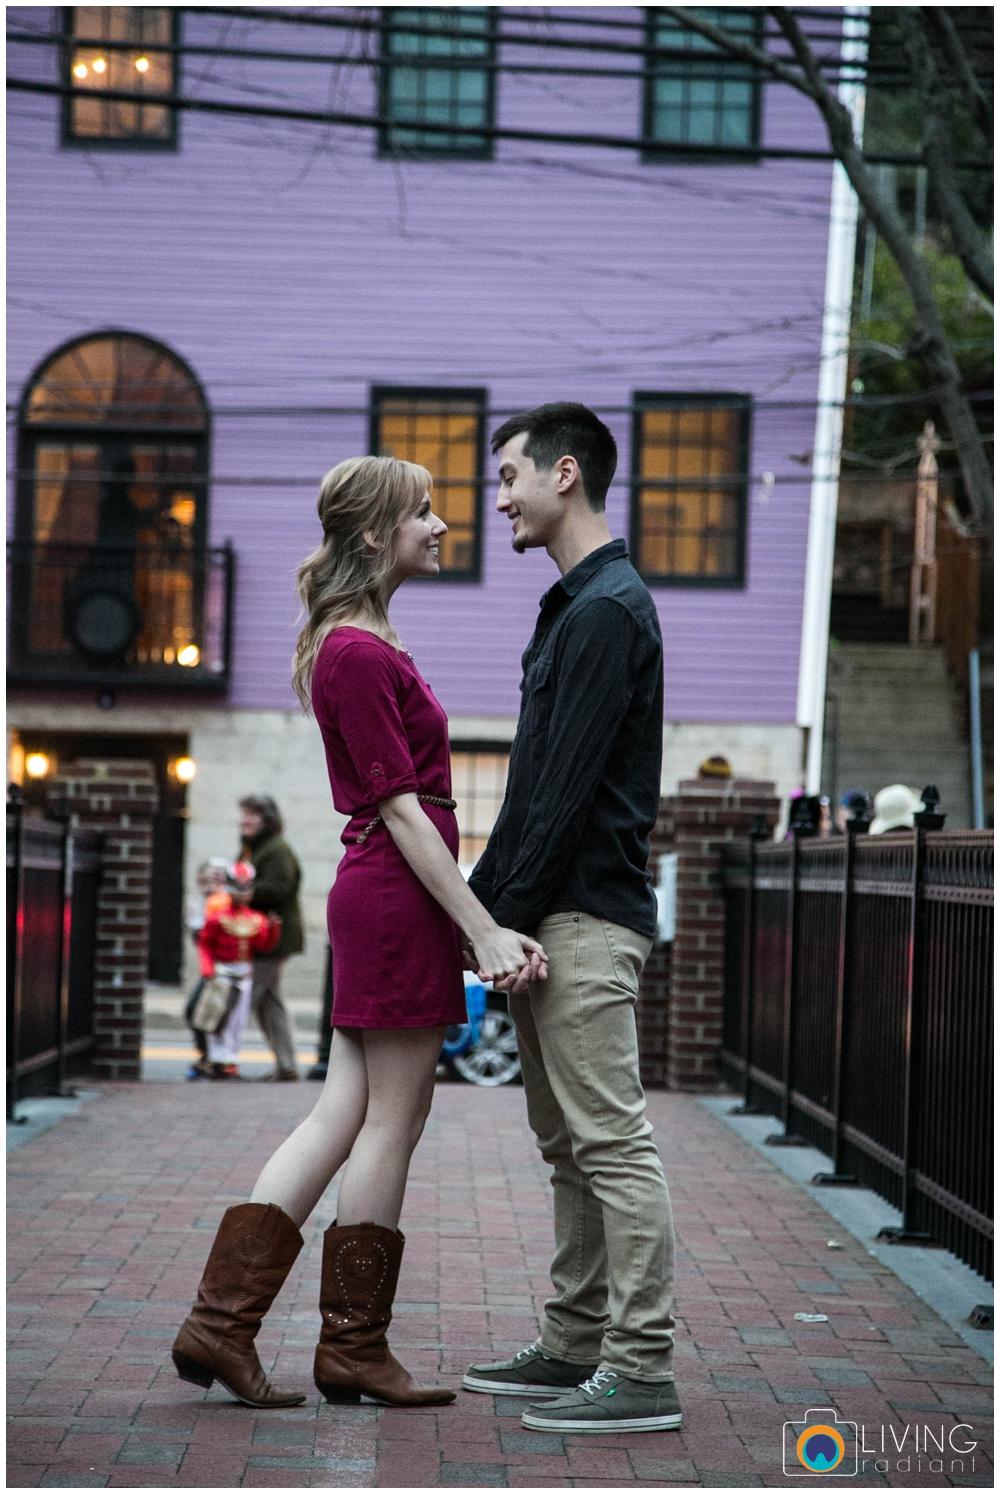 josh+nichele-engaged-old-ellicott-city-baltimore-engagement-session-outdoor-weddings-love-living-radiant-photography_0014.jpg